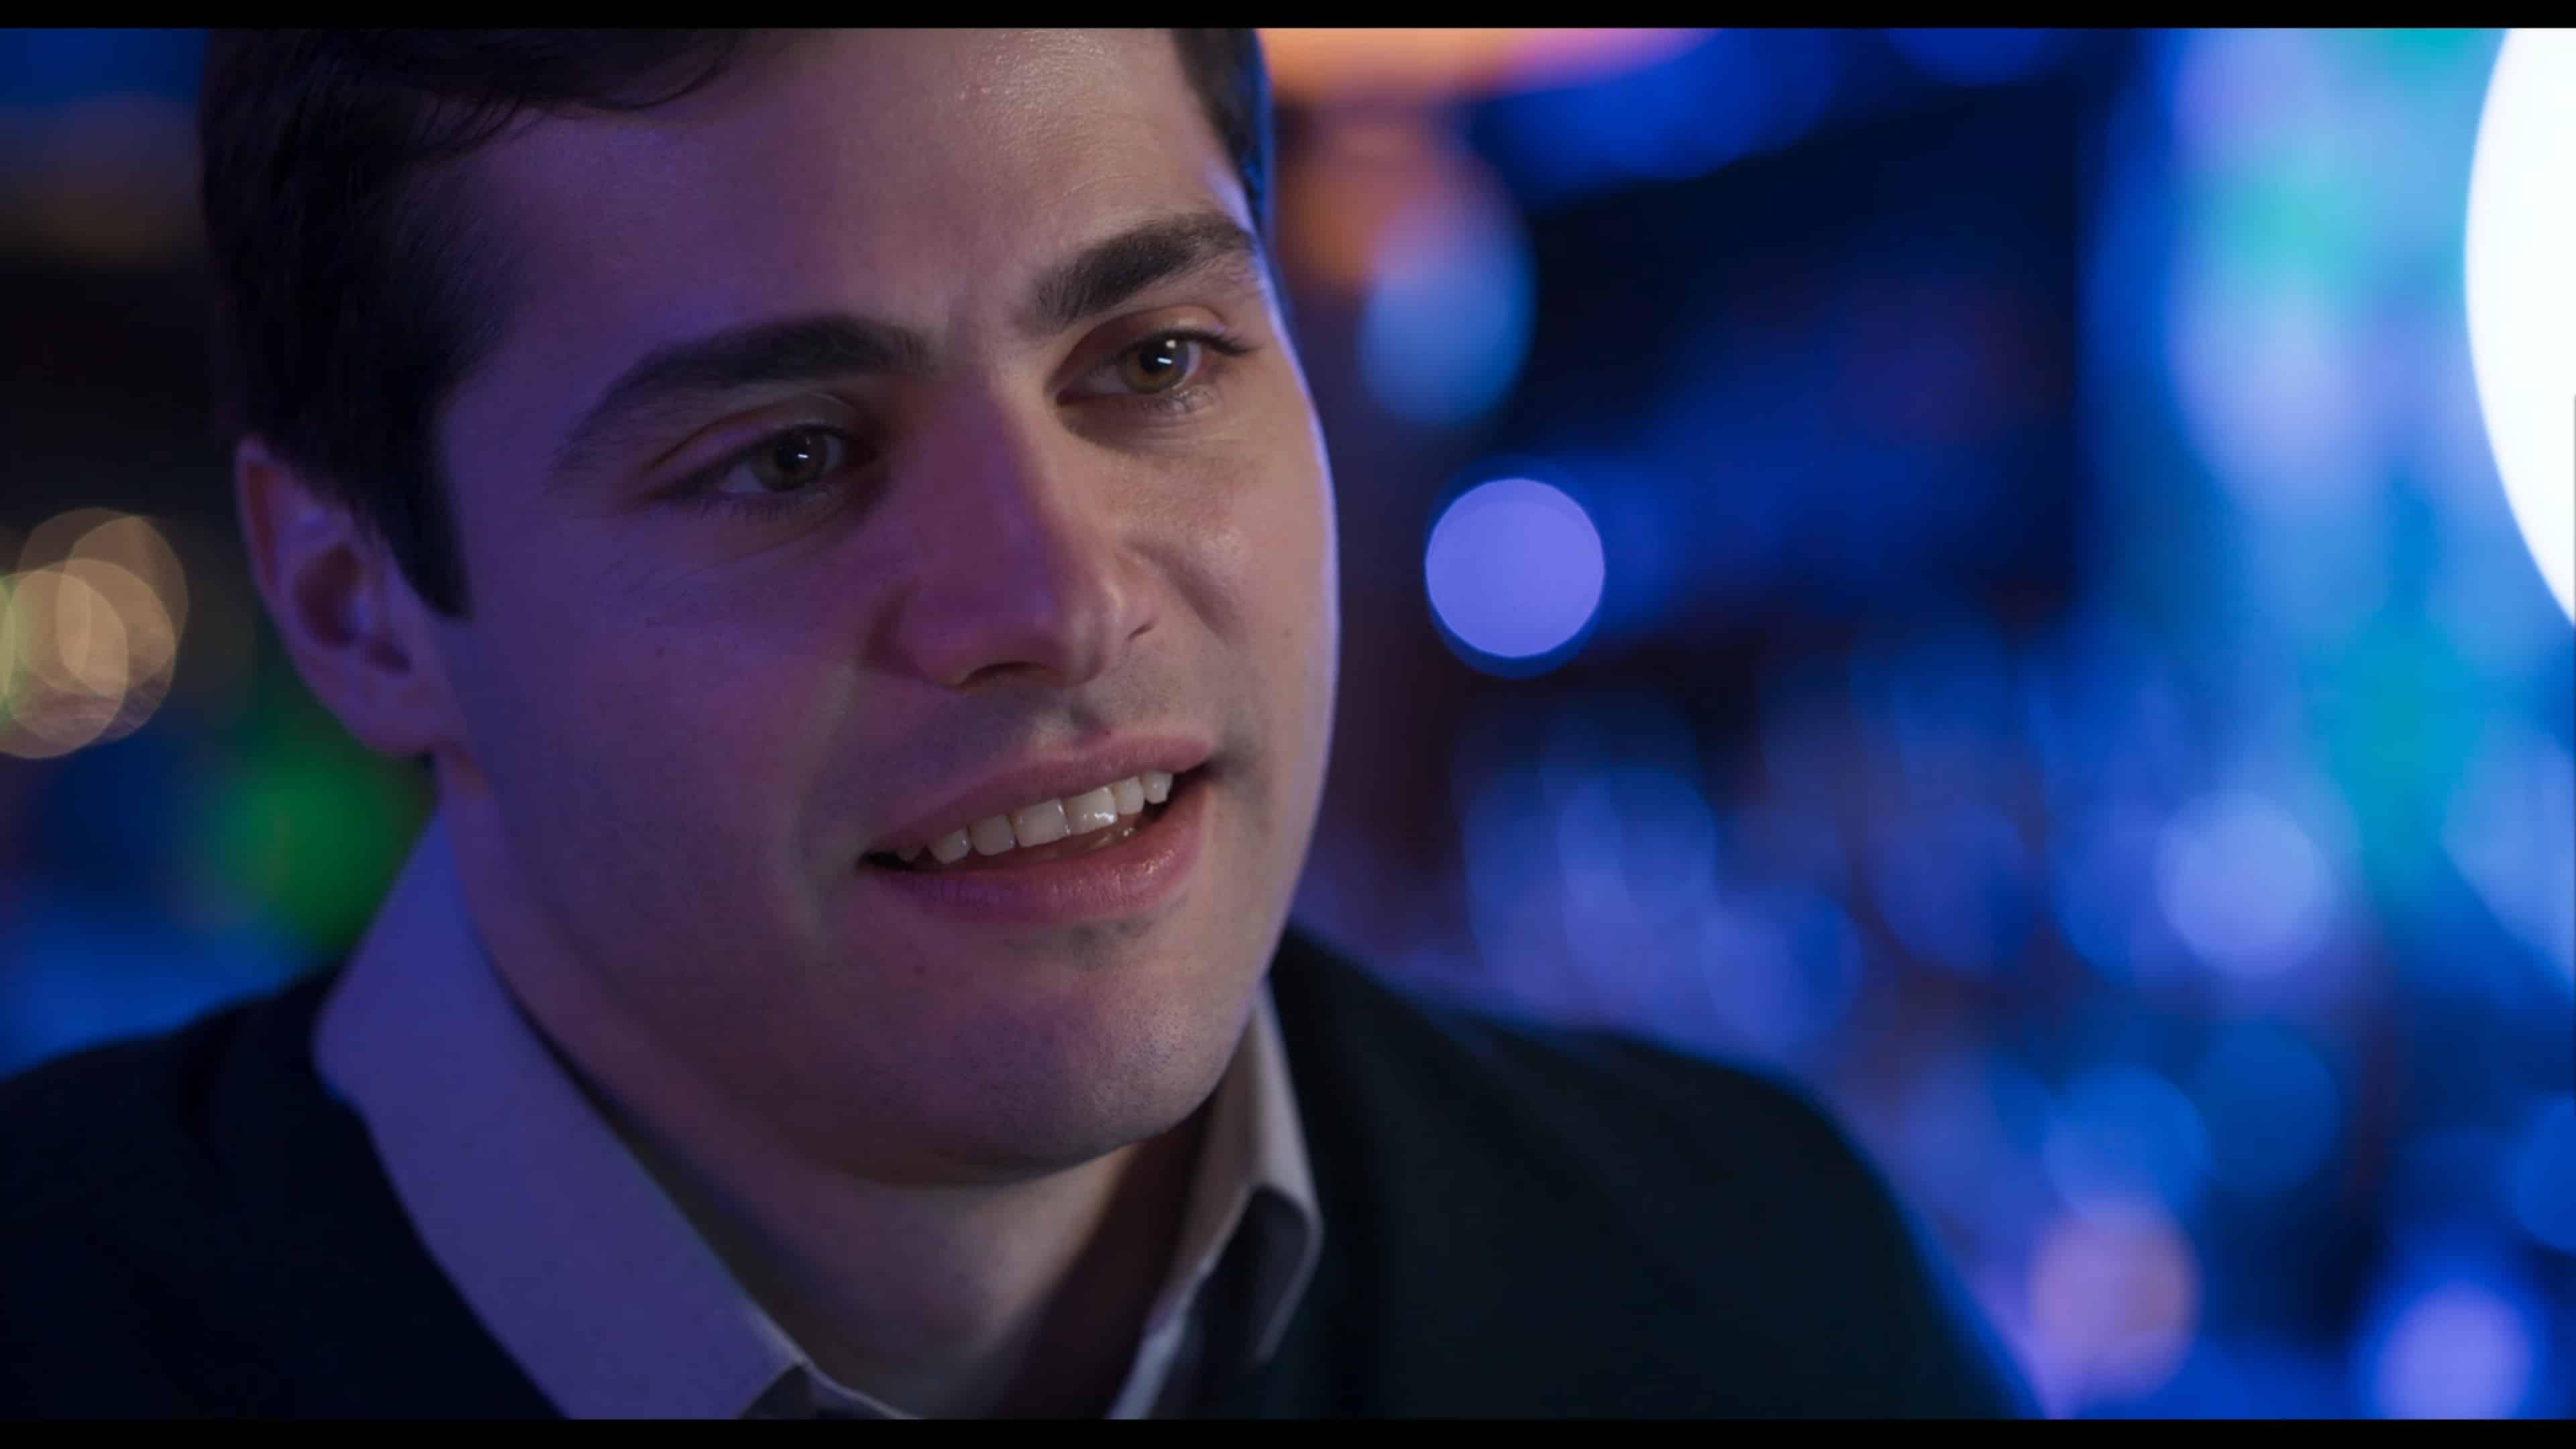 Owen (Matthew Daddario) at a bar, talking to Amy